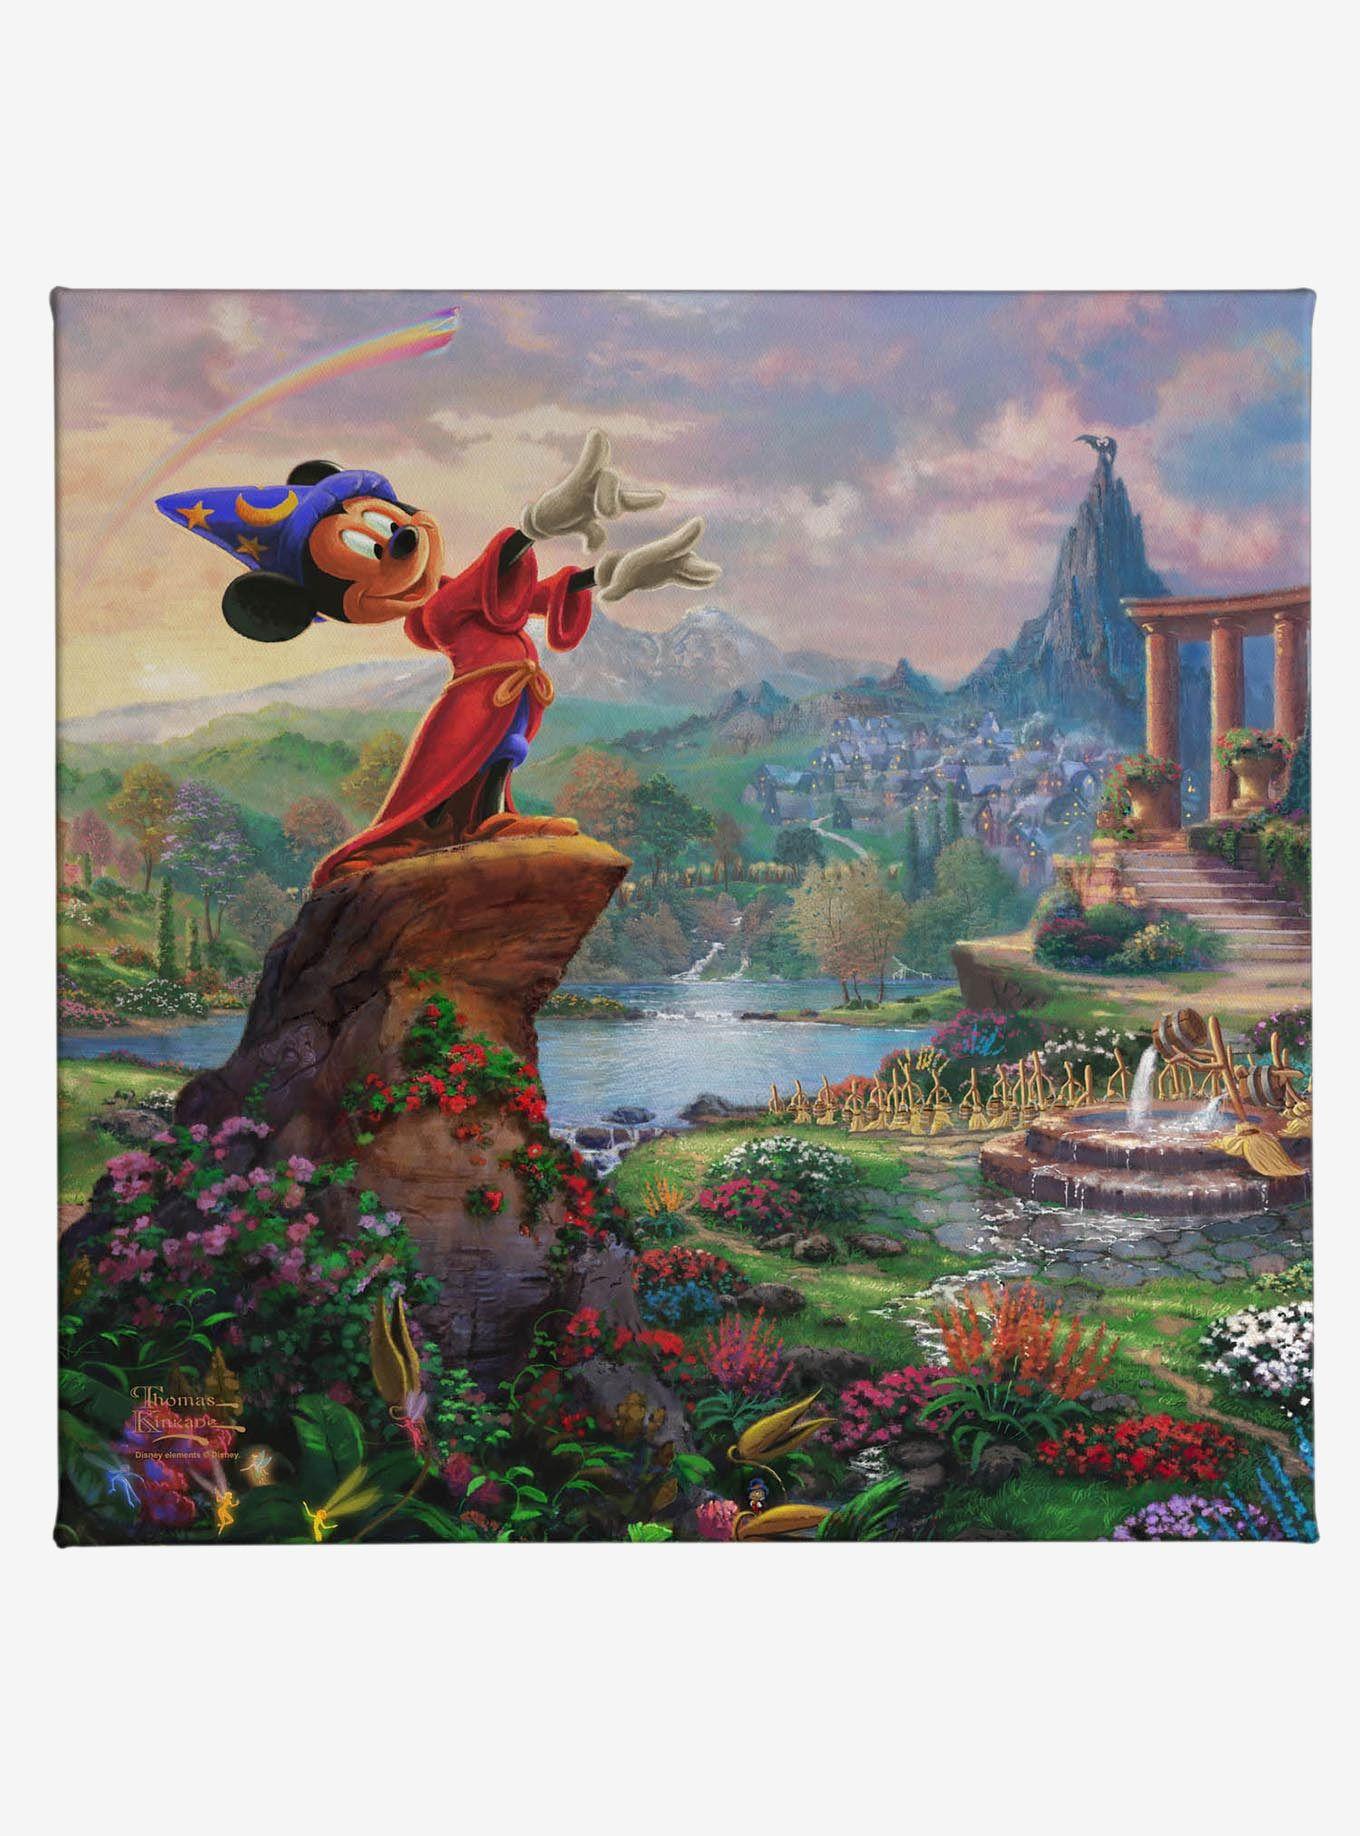 Disney Fantasia Gallery Wrapped Canvas in 2020 Thomas